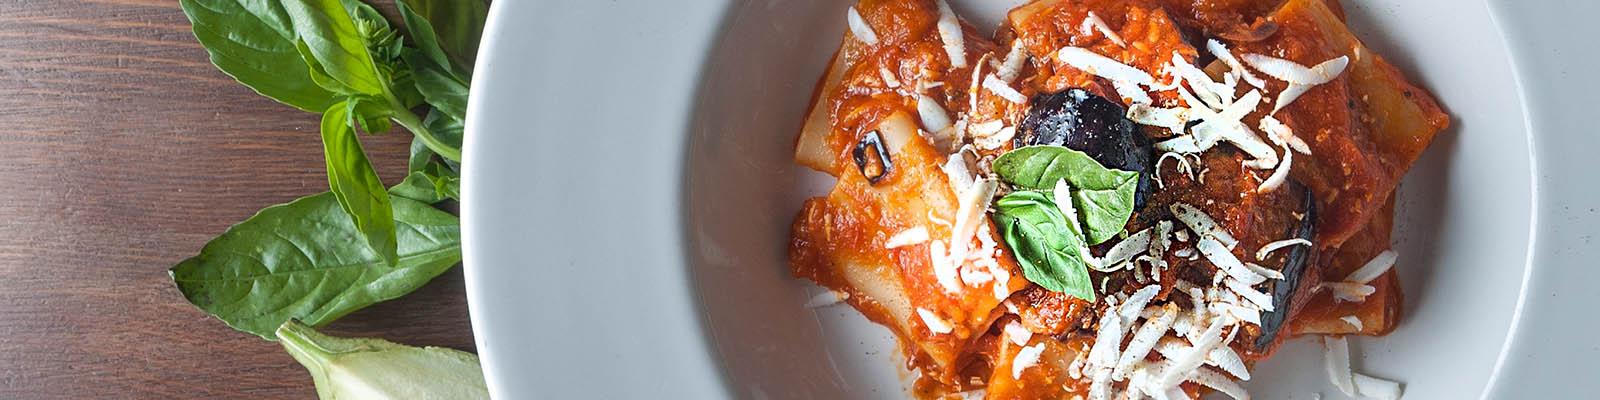 Pasta Garofalo - Schiaffoni alla norma